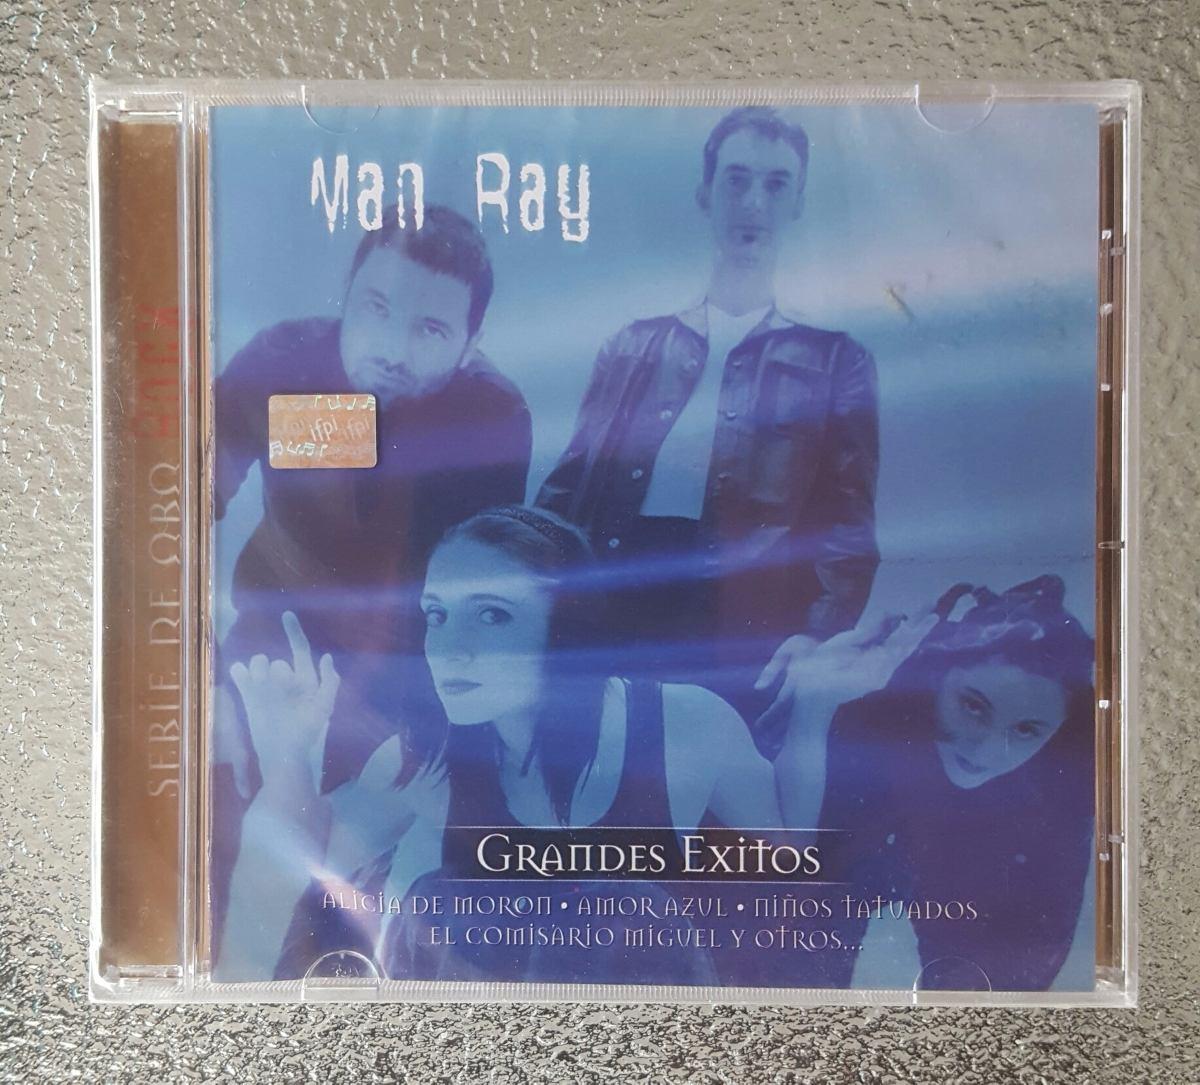 850f6a046428 Man Ray - Grandes Éxitos - Serie De Oro - Sellado -   100